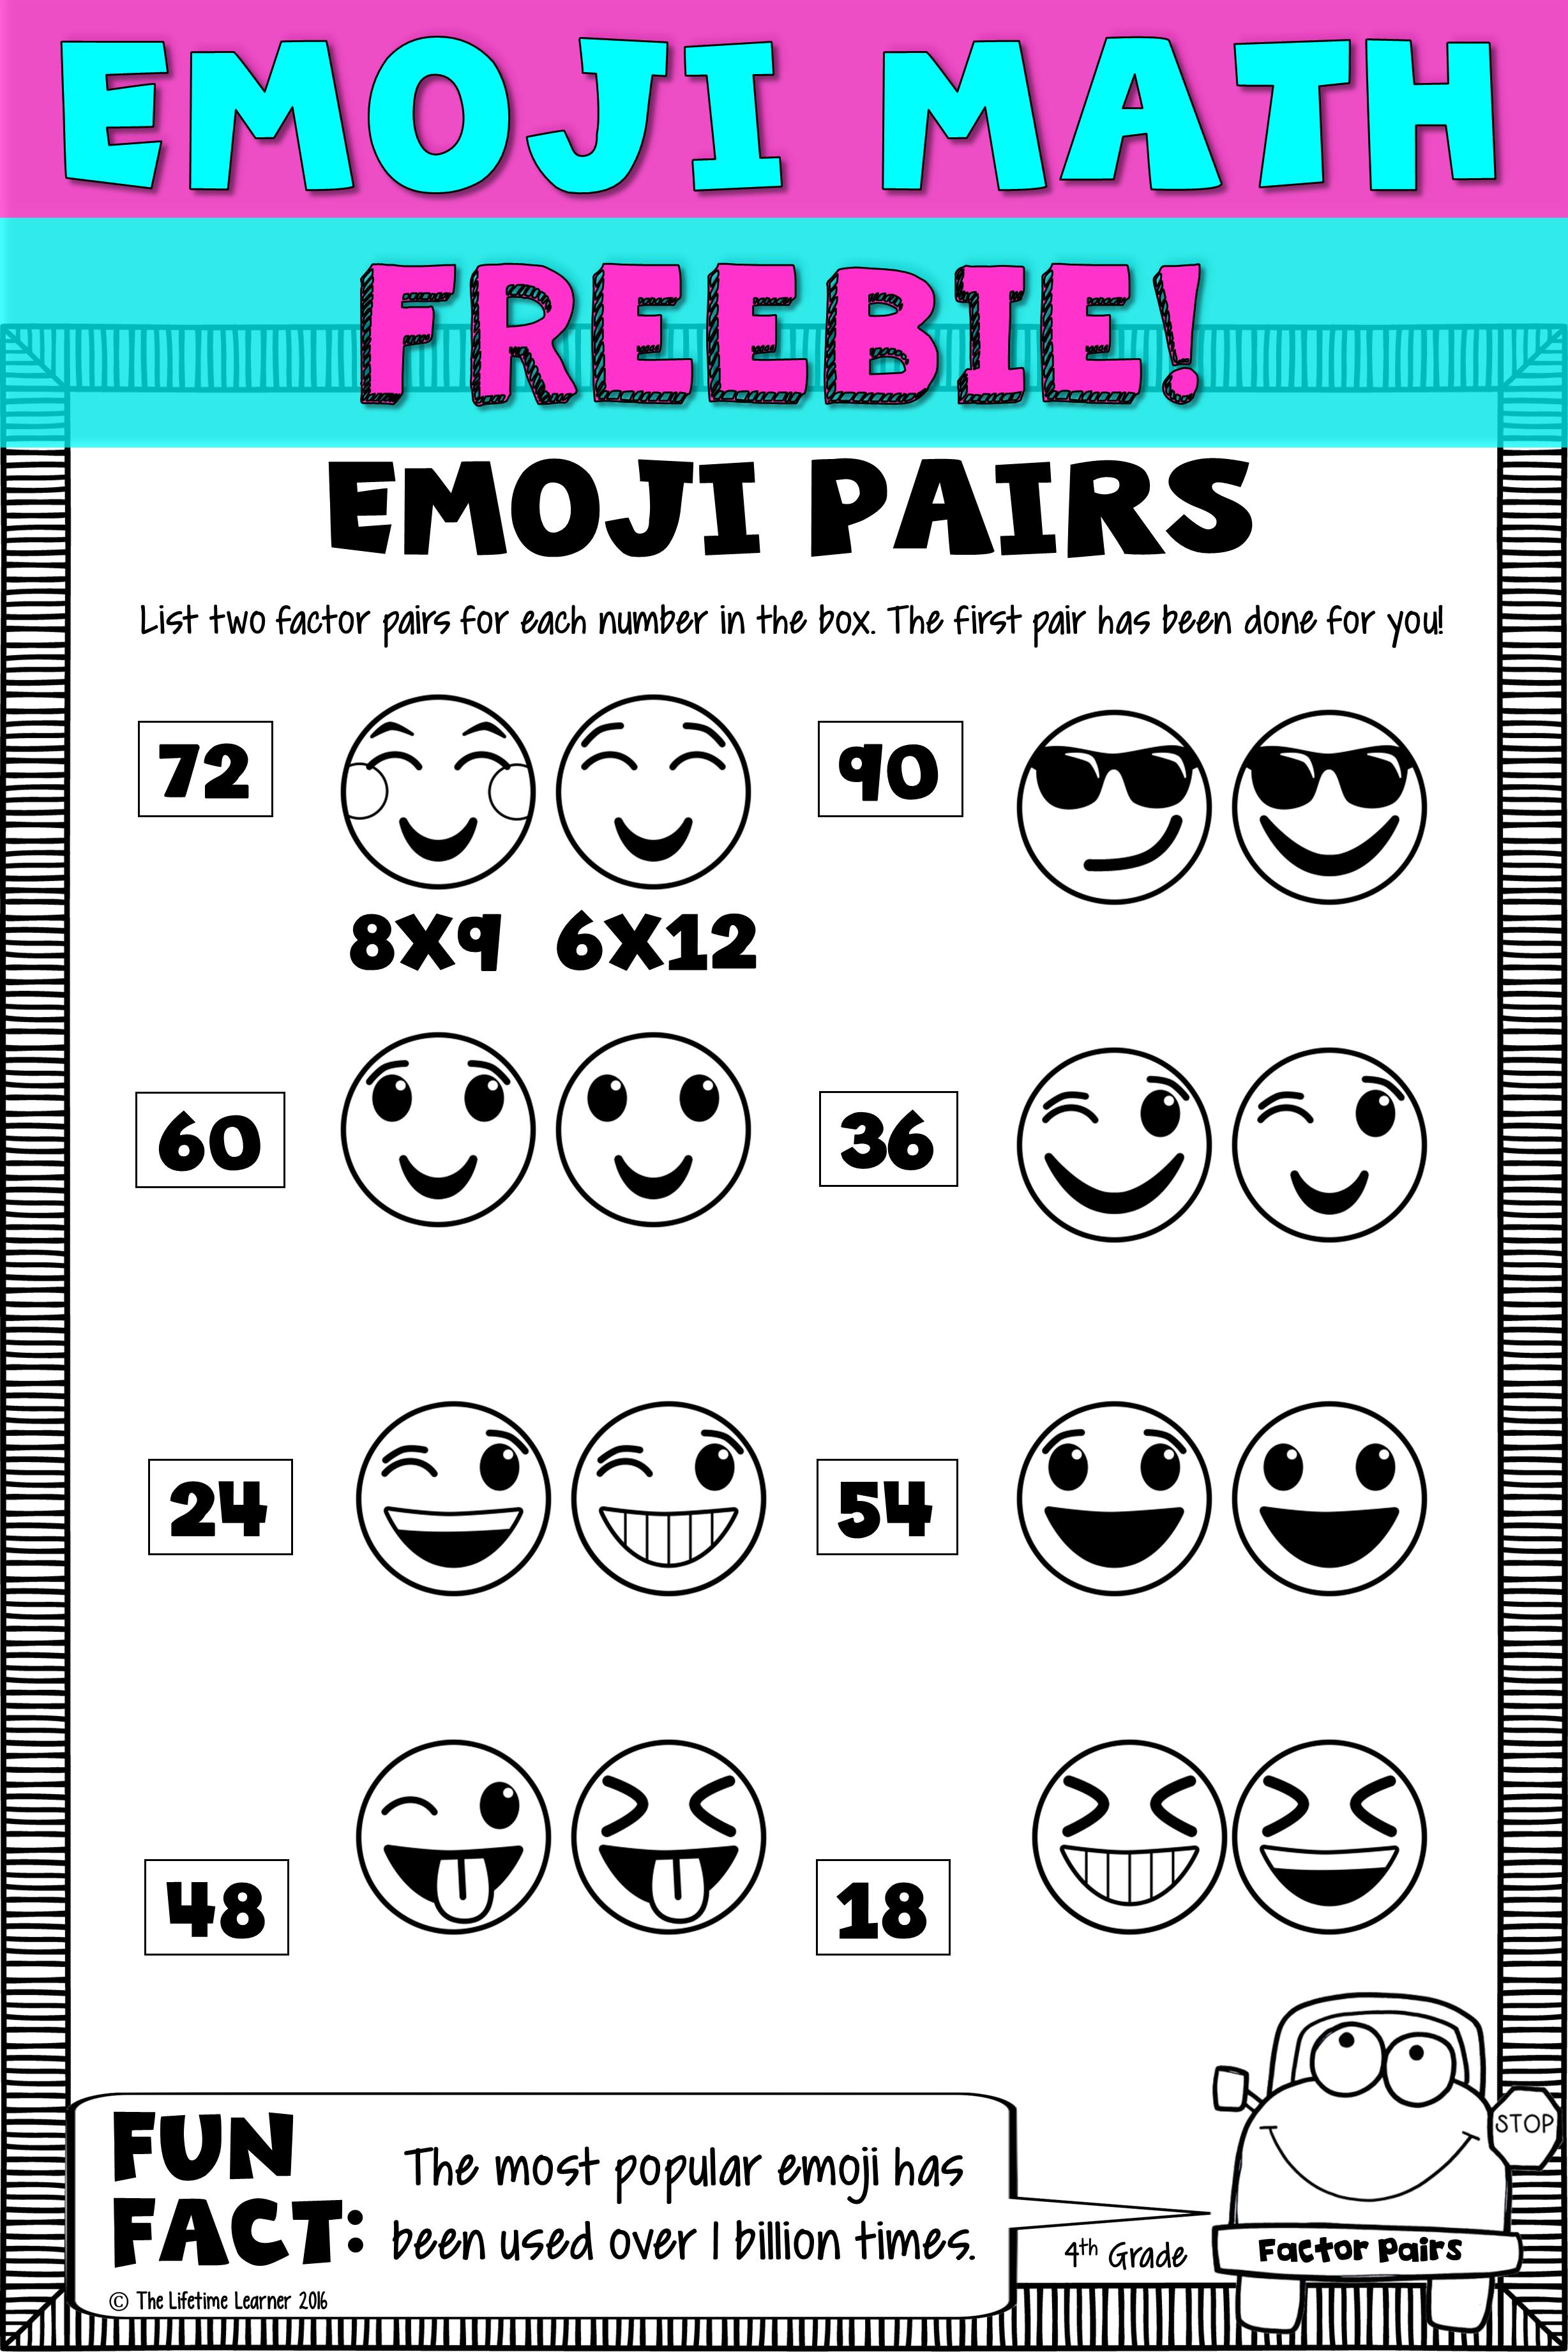 Emoji Math Freebie